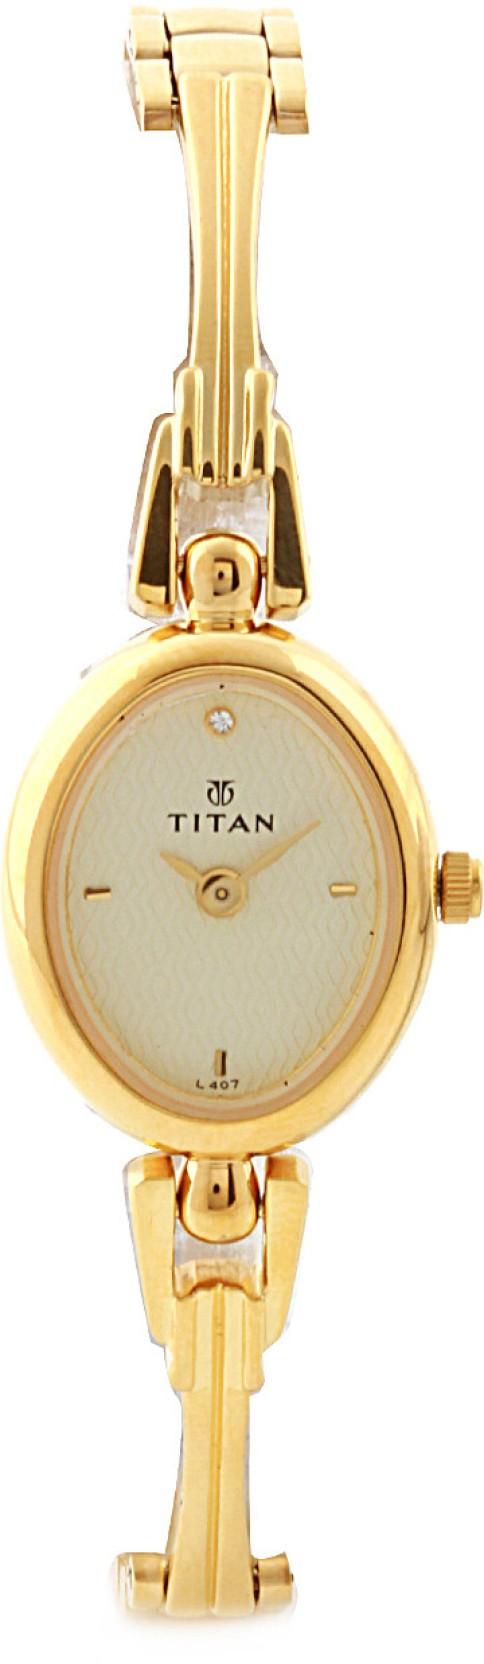 titan nf340ym02 karishma analog for buy